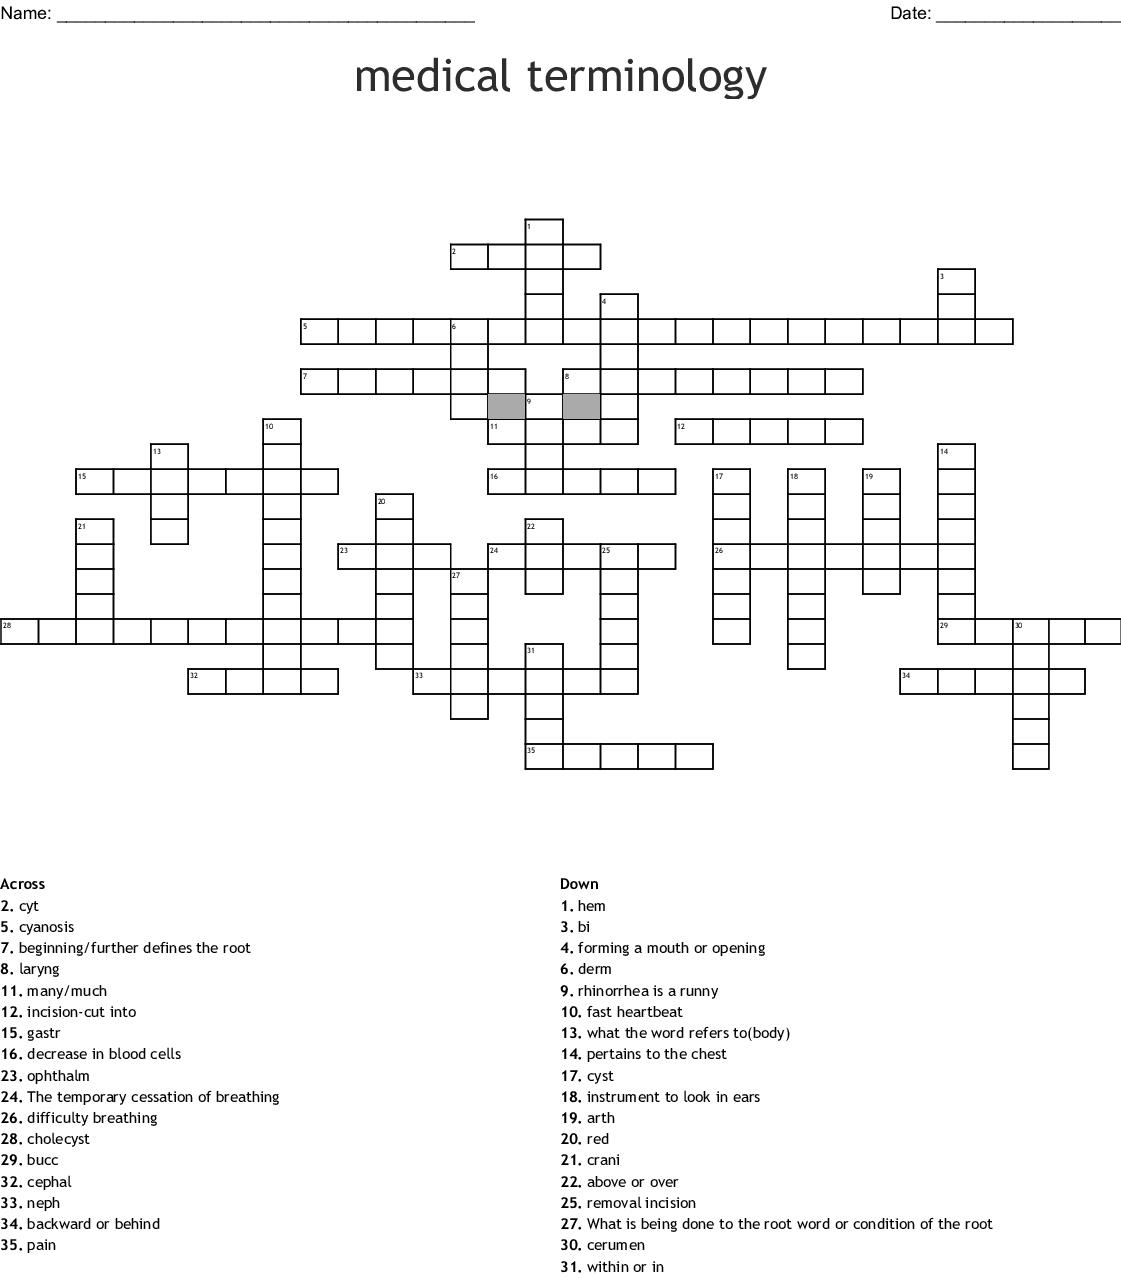 Medical Terminology Suffixes And Prefixes Crossword